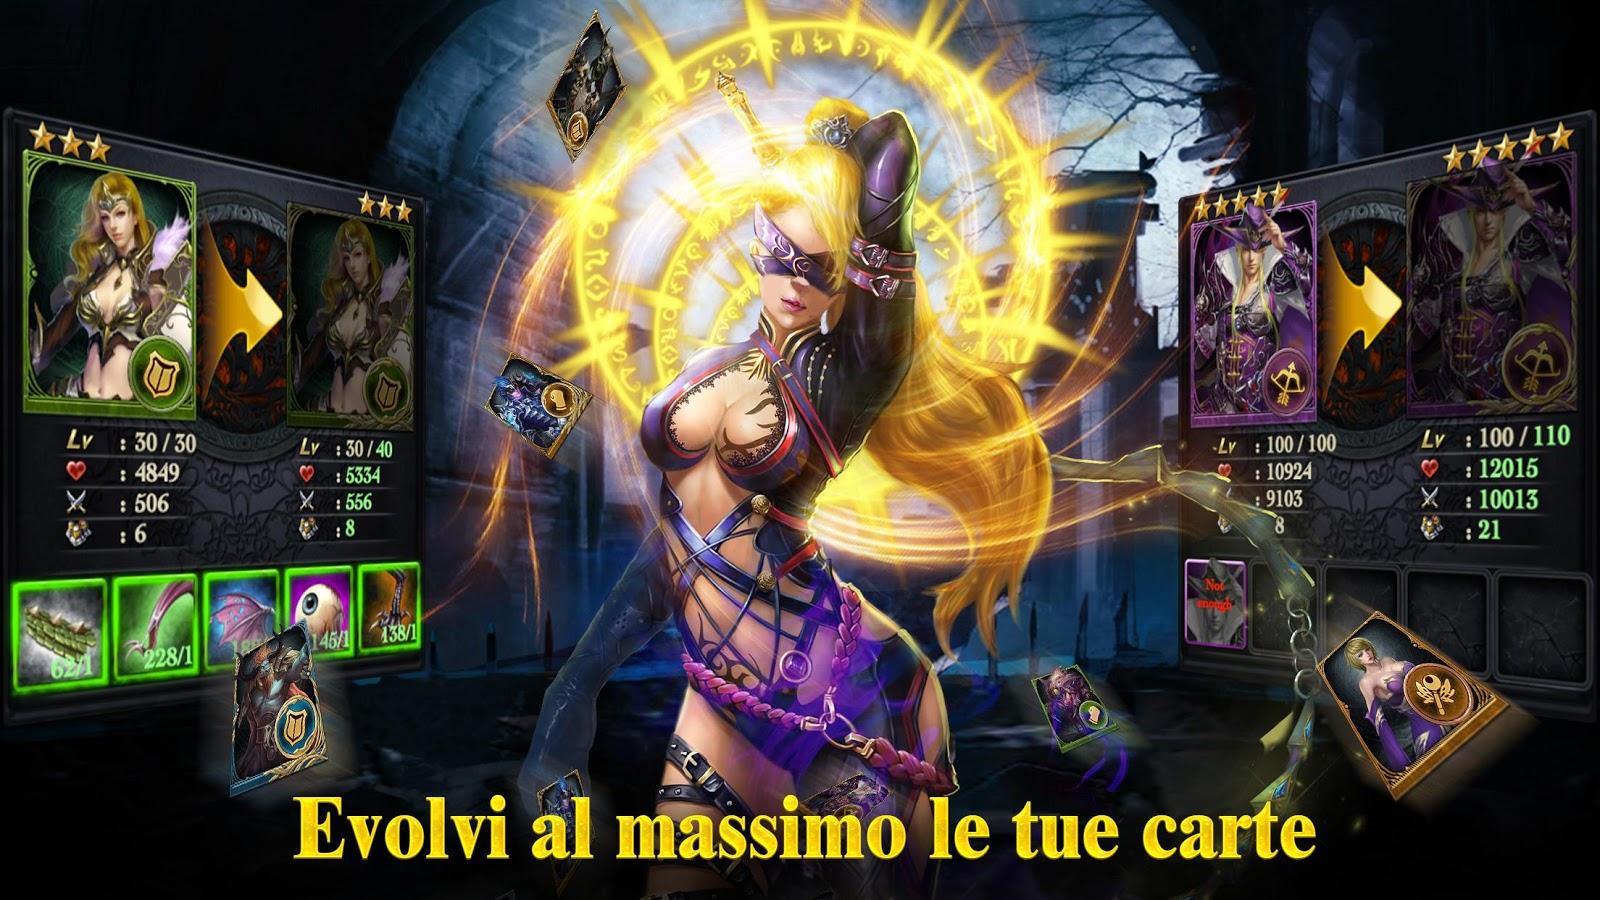 Demon Slayer - Italiano 2 6 APK Download - Android Role